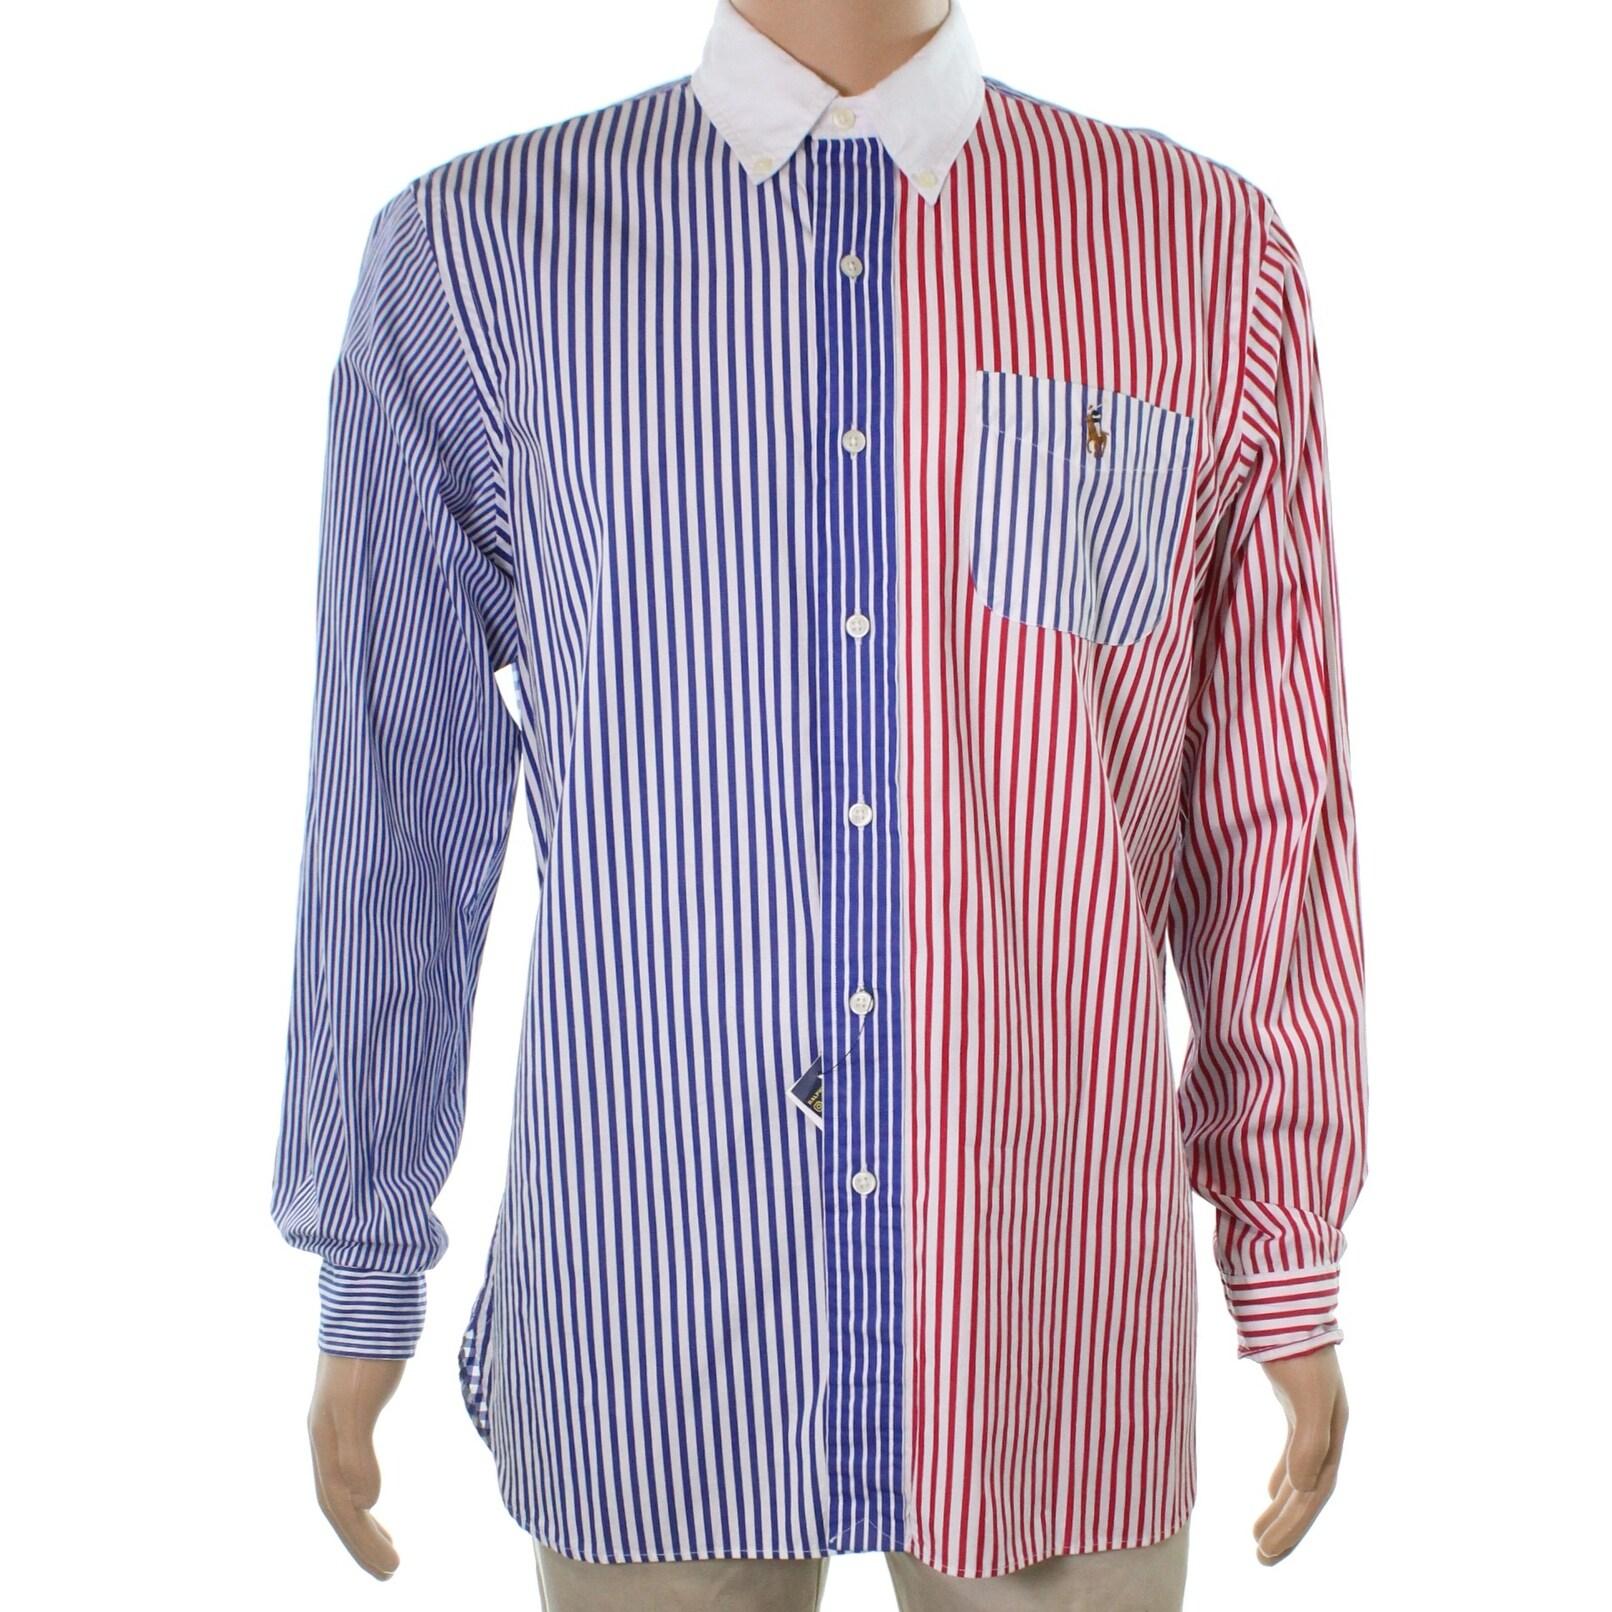 Ralph Lauren Mens Pink Color Dress Shirt Bcd Tofu House